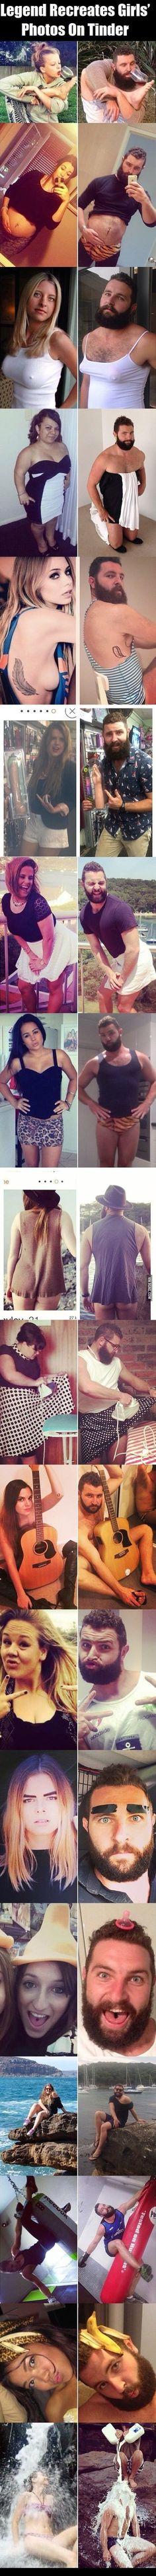 Legend recreates girls photos on tinder...